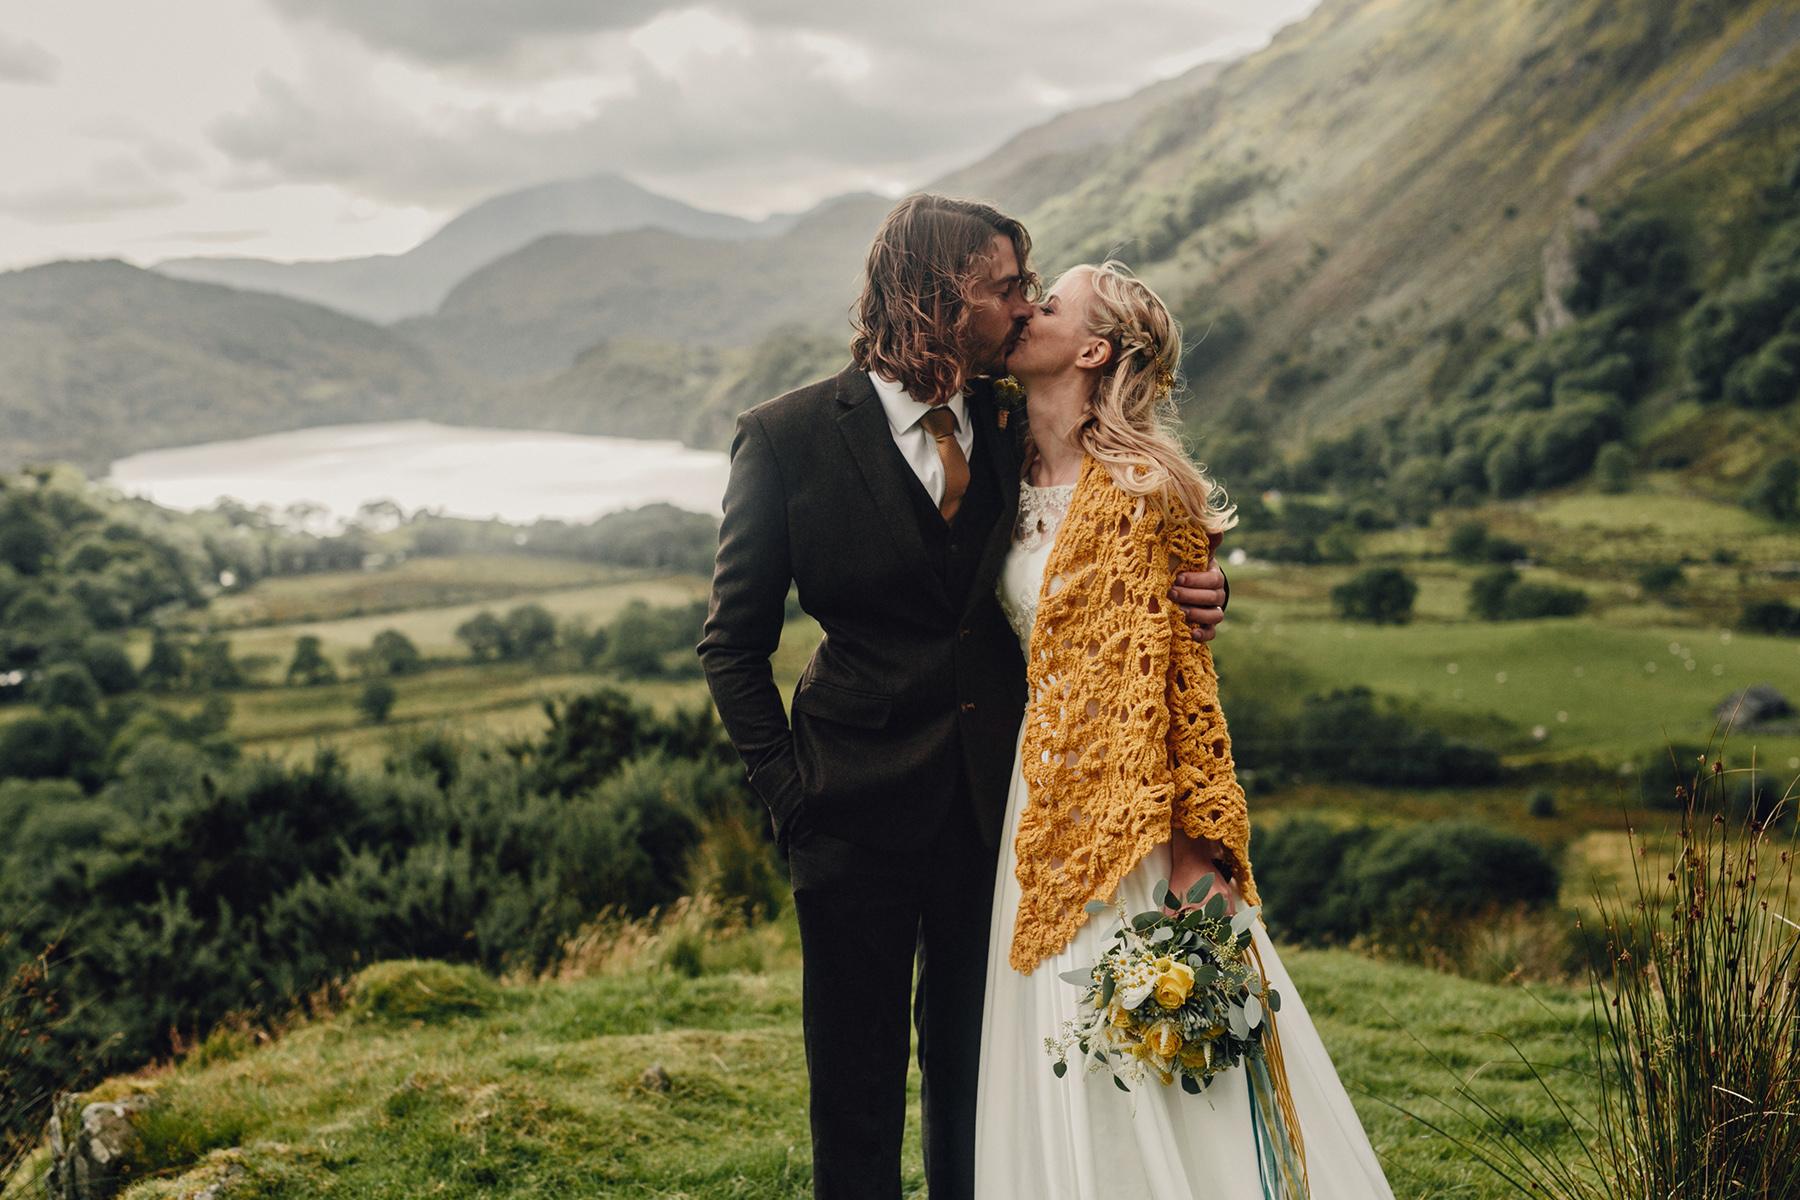 Snowdonia-Wales-Wedding-Photos-0359.jpg